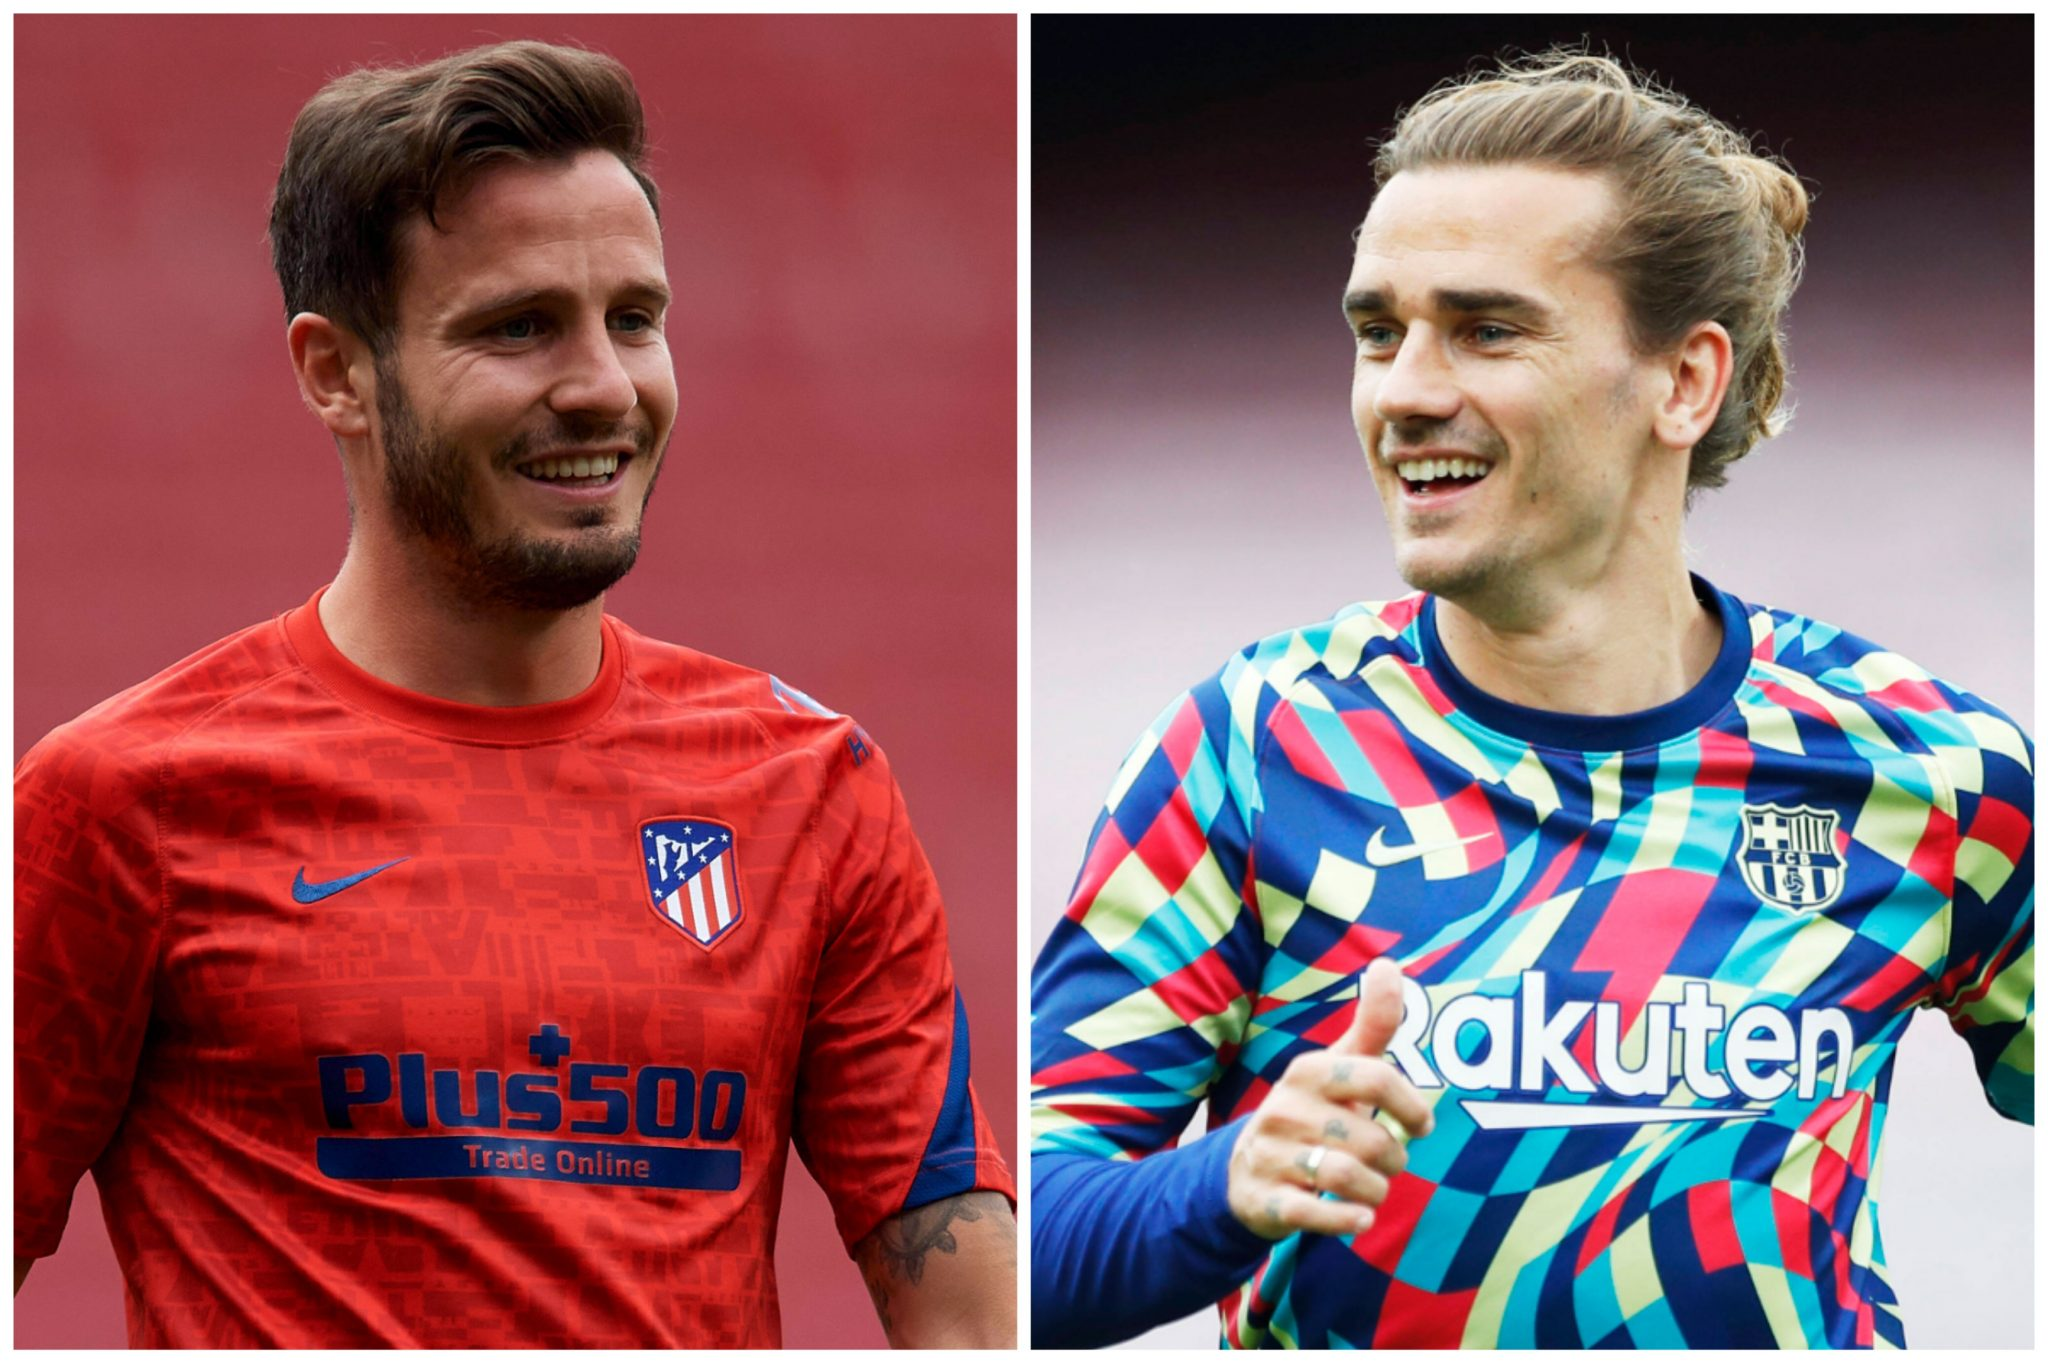 Barcelona và Atletico đồng ý về việc hoán đổi Griezmann – Saul